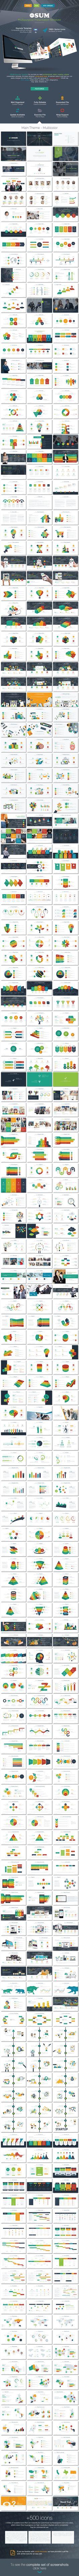 OSUM Multipurpose Presentation Template. Download here: http://graphicriver.net/item/osum-multipurpose-presentation-template/16124352?ref=ksioks